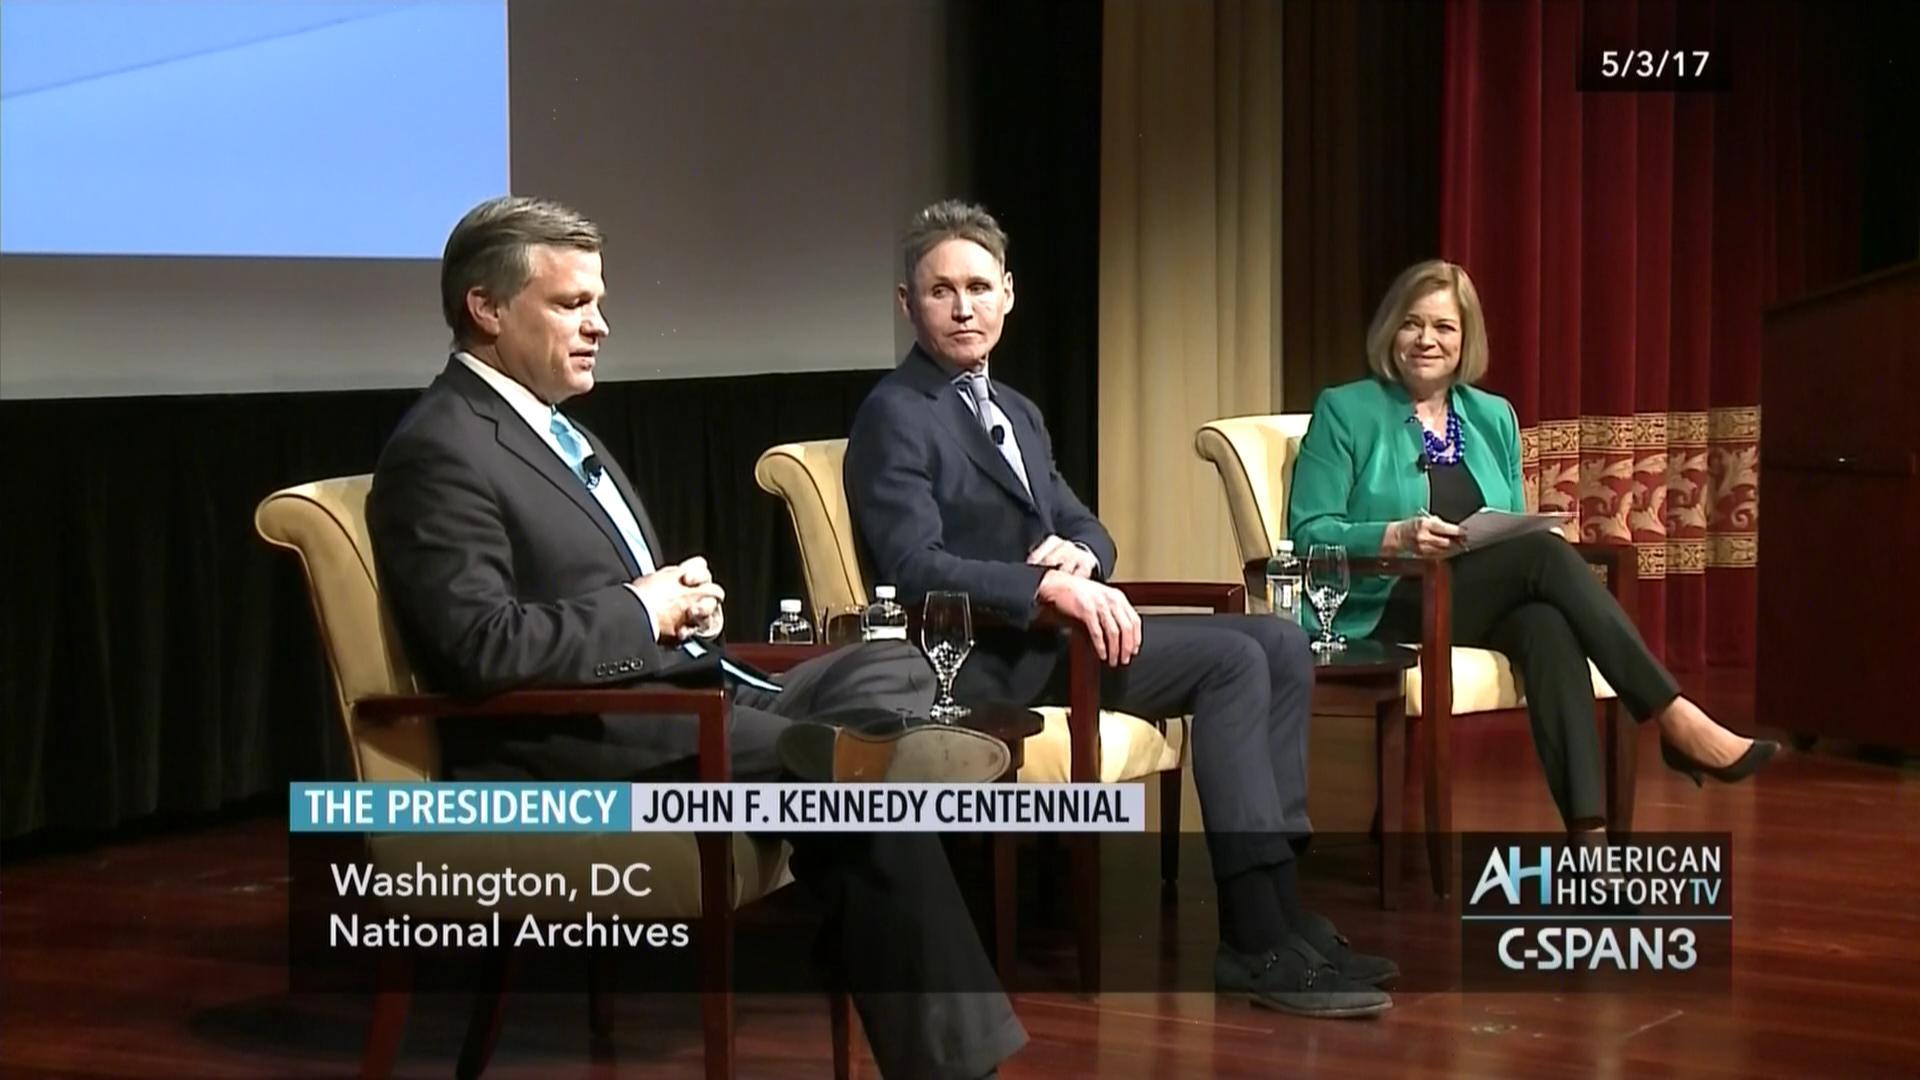 John F Kennedy Centennial, May 3 2017 | Video | C-SPAN.org